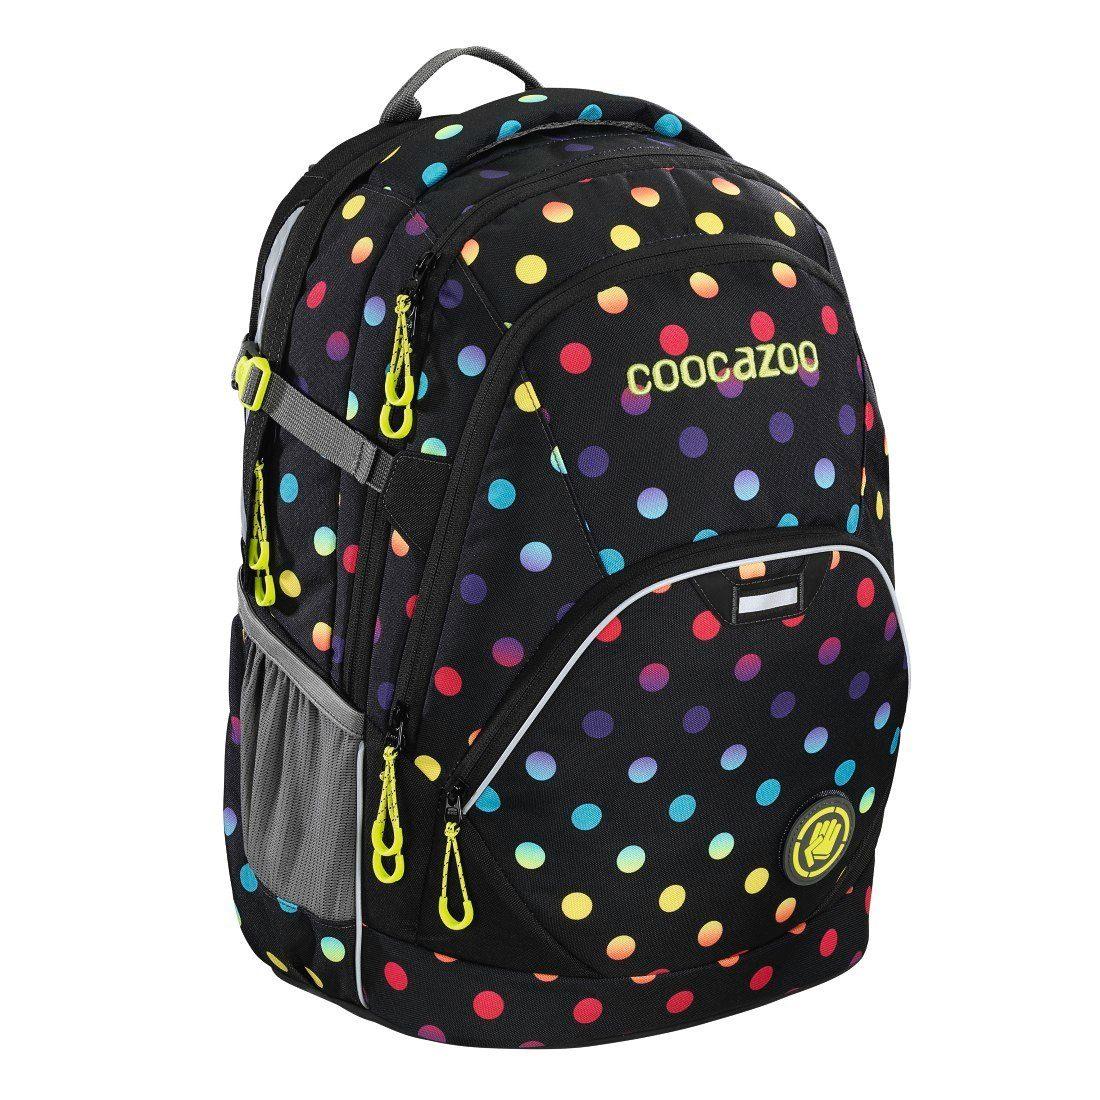 Coocazoo Rucksack EvverClevver2, Magic Polka Colorful